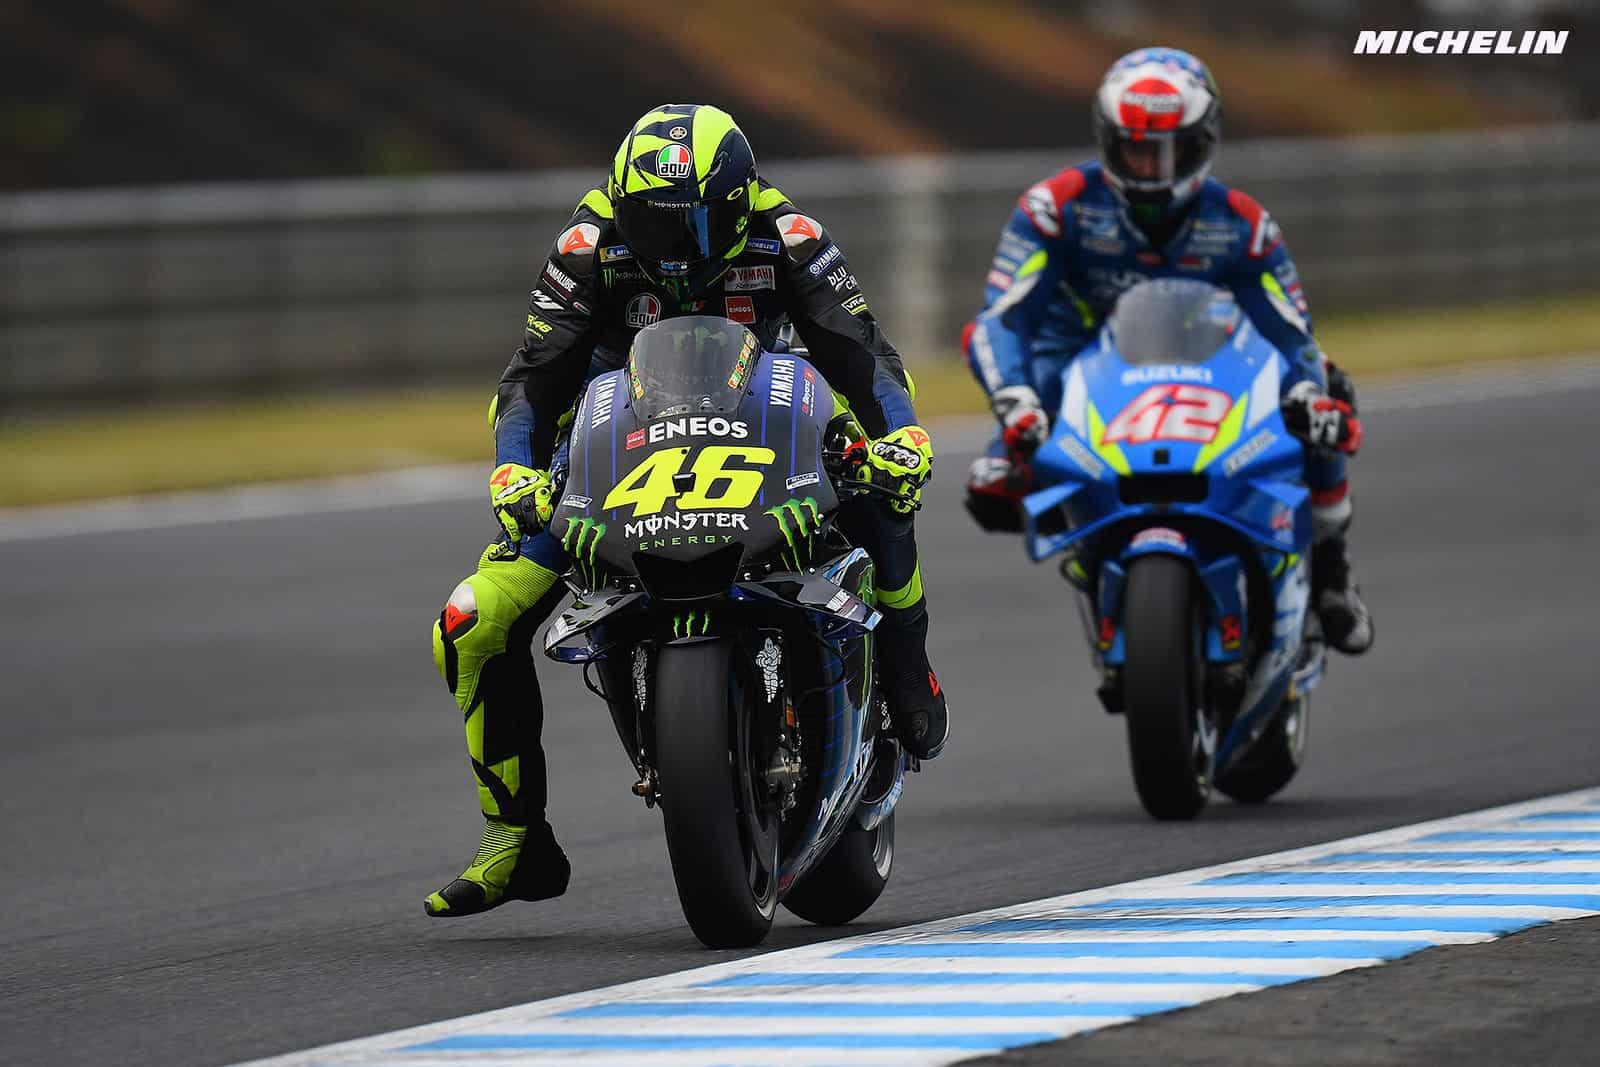 MotoGP2019オーストラリアGP ロッシ「過去数戦でスピードを発揮出来ていない」